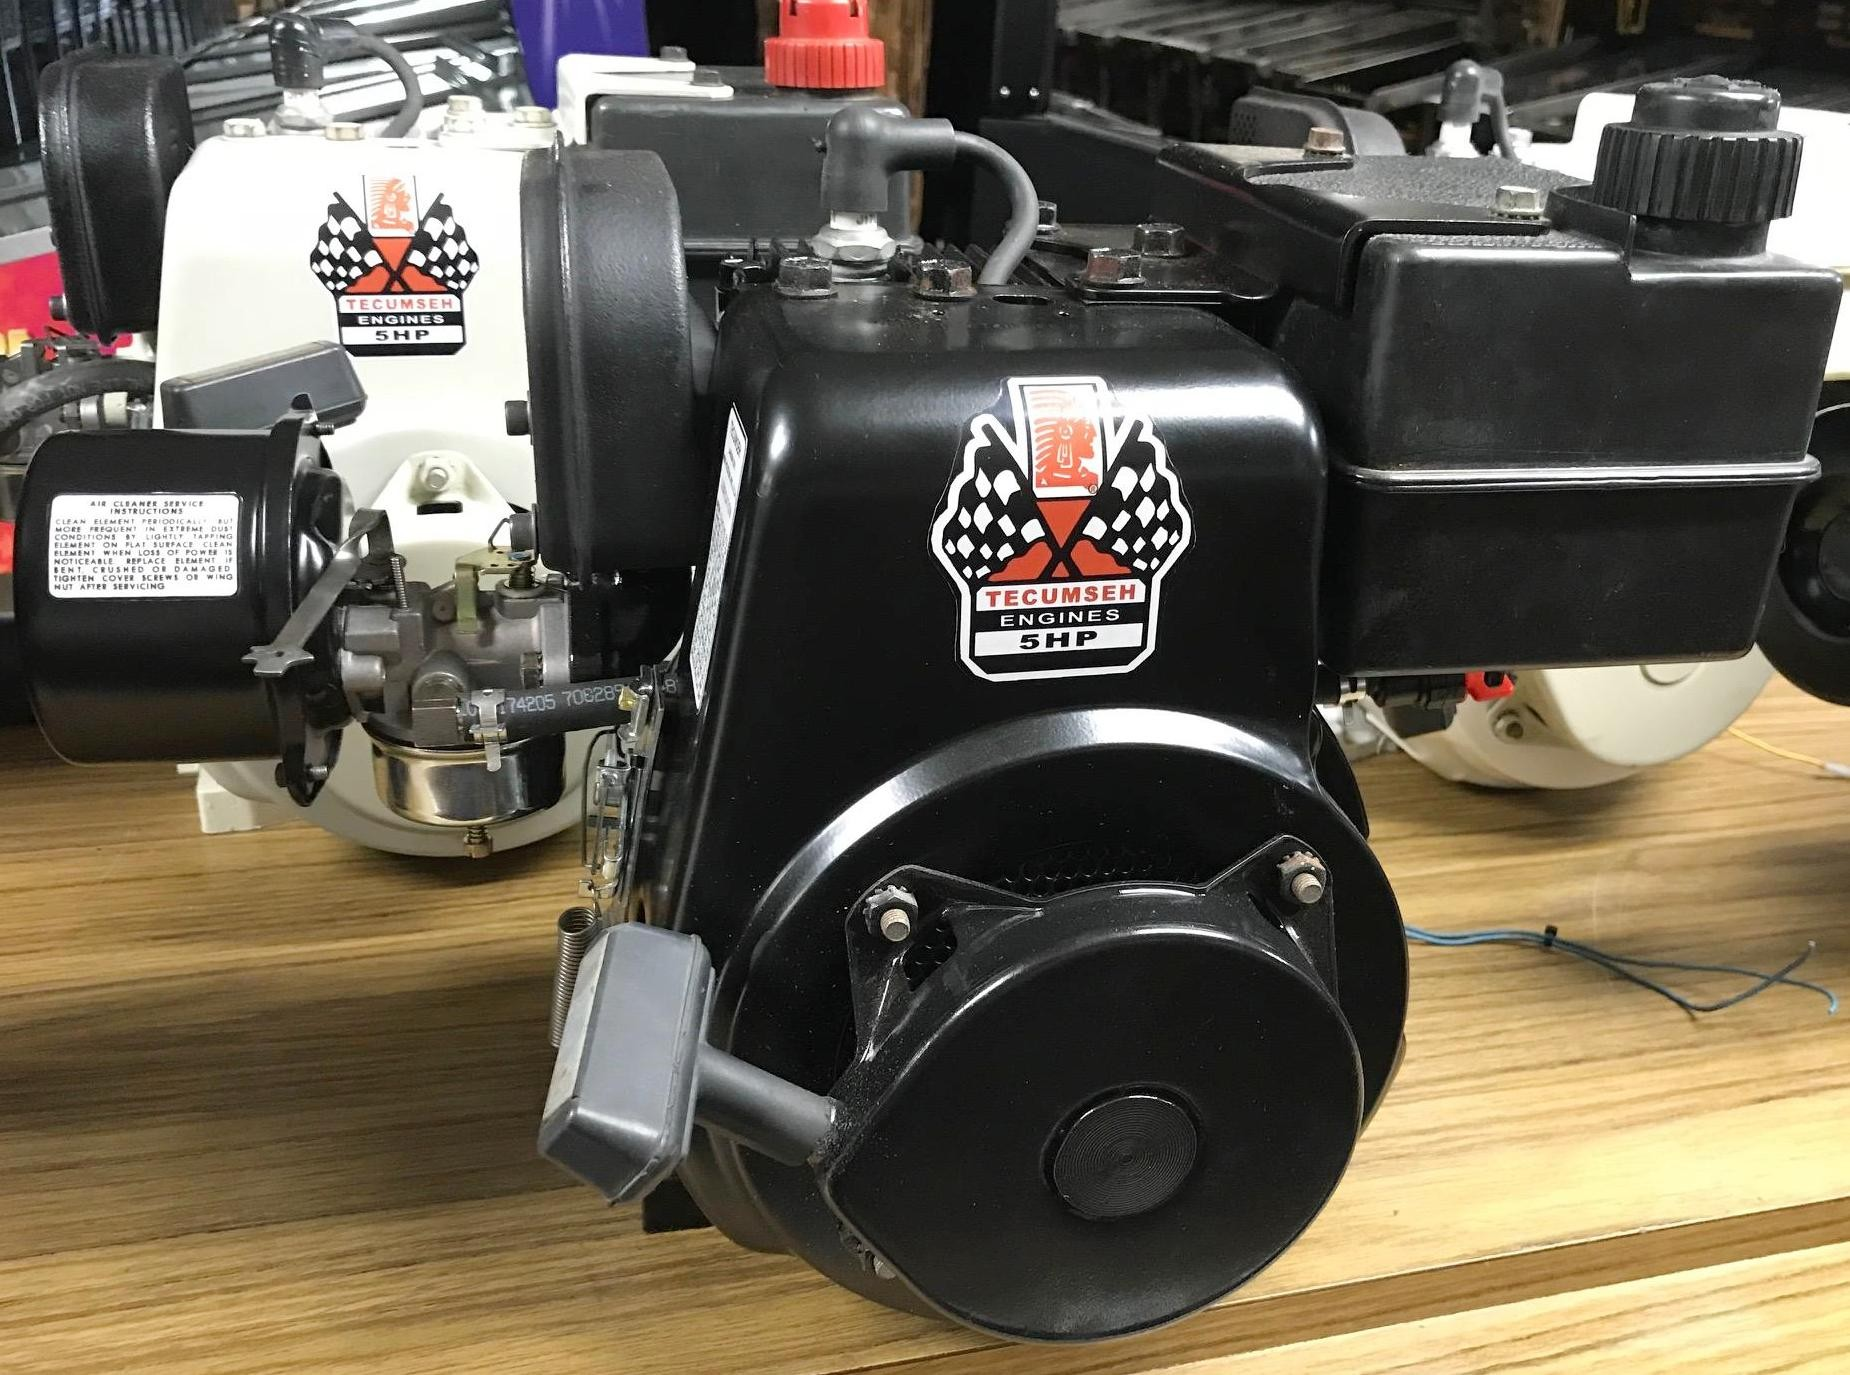 Wiring Diagram for Predator 420cc Ohv Tecumseh Engine Rebuild for Mini Bikes Conversion From Snow Of Wiring Diagram for Predator 420cc Ohv